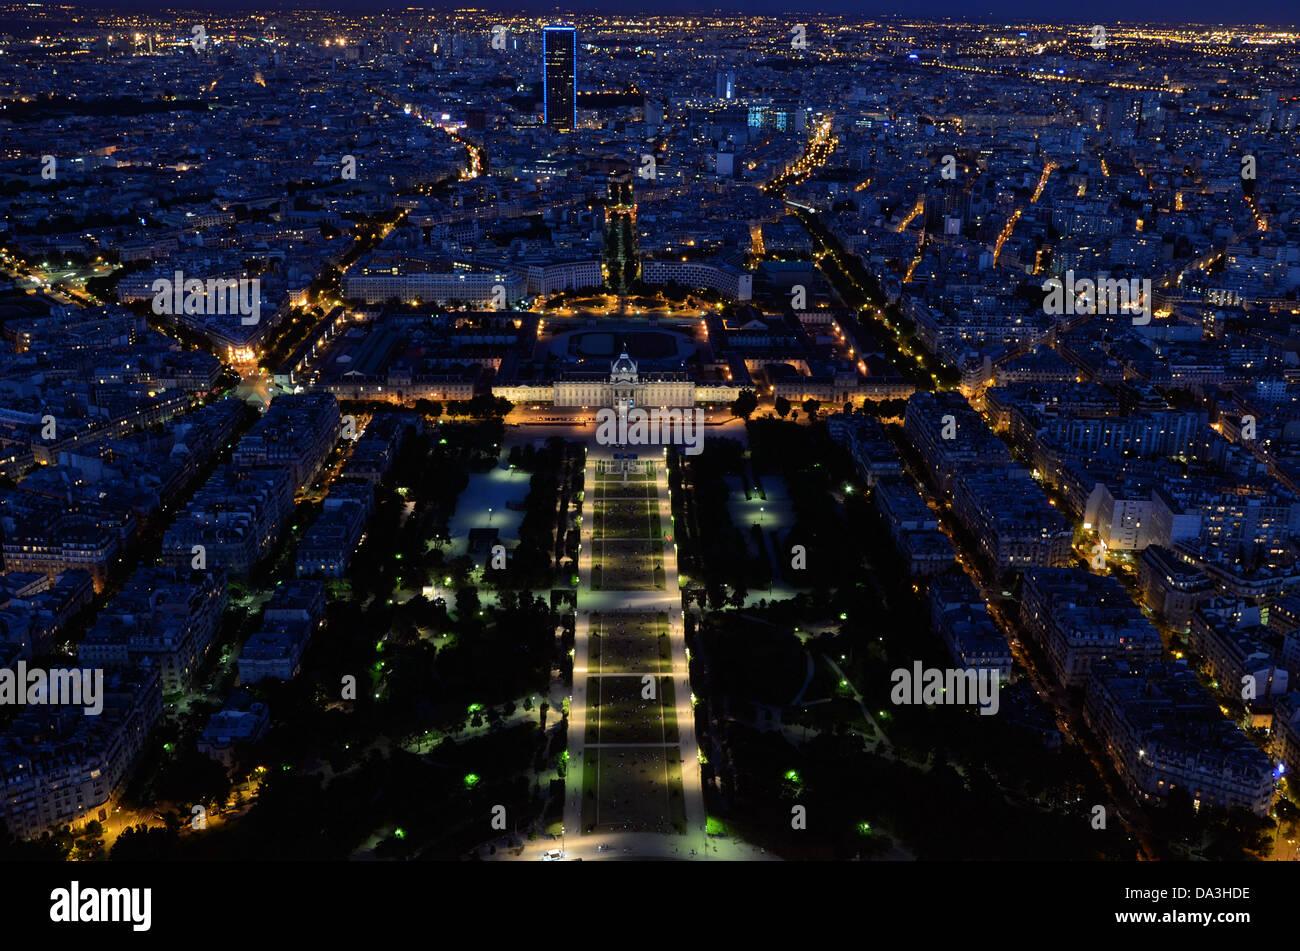 the-champ-de-mars-is-a-large-public-greenspace-in-paris-france-located-DA3HDE.jpg